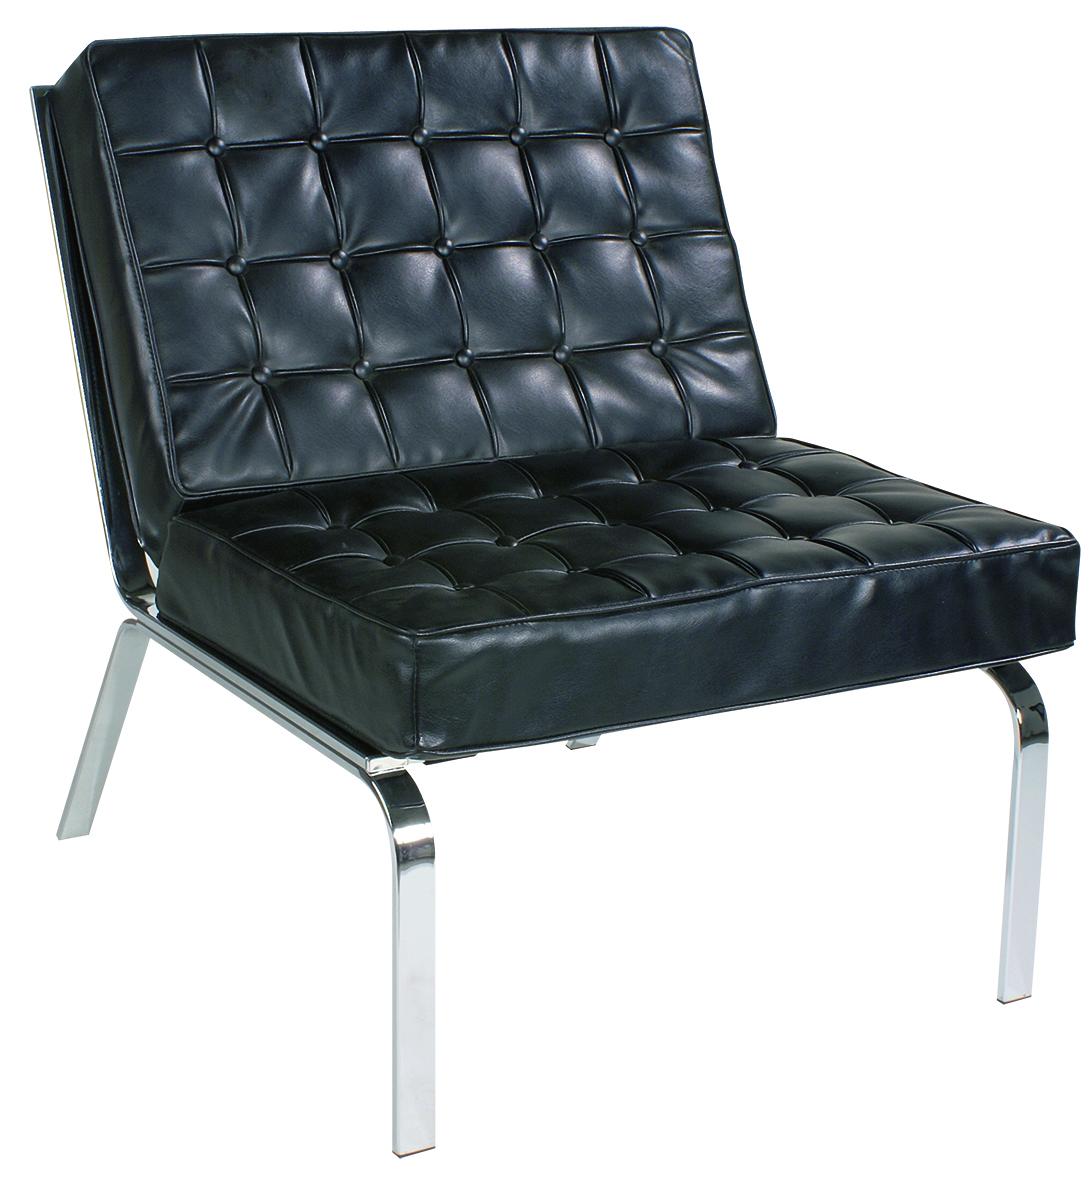 EXPO Designer Sessel - Designersessel, weltweit beliebt!